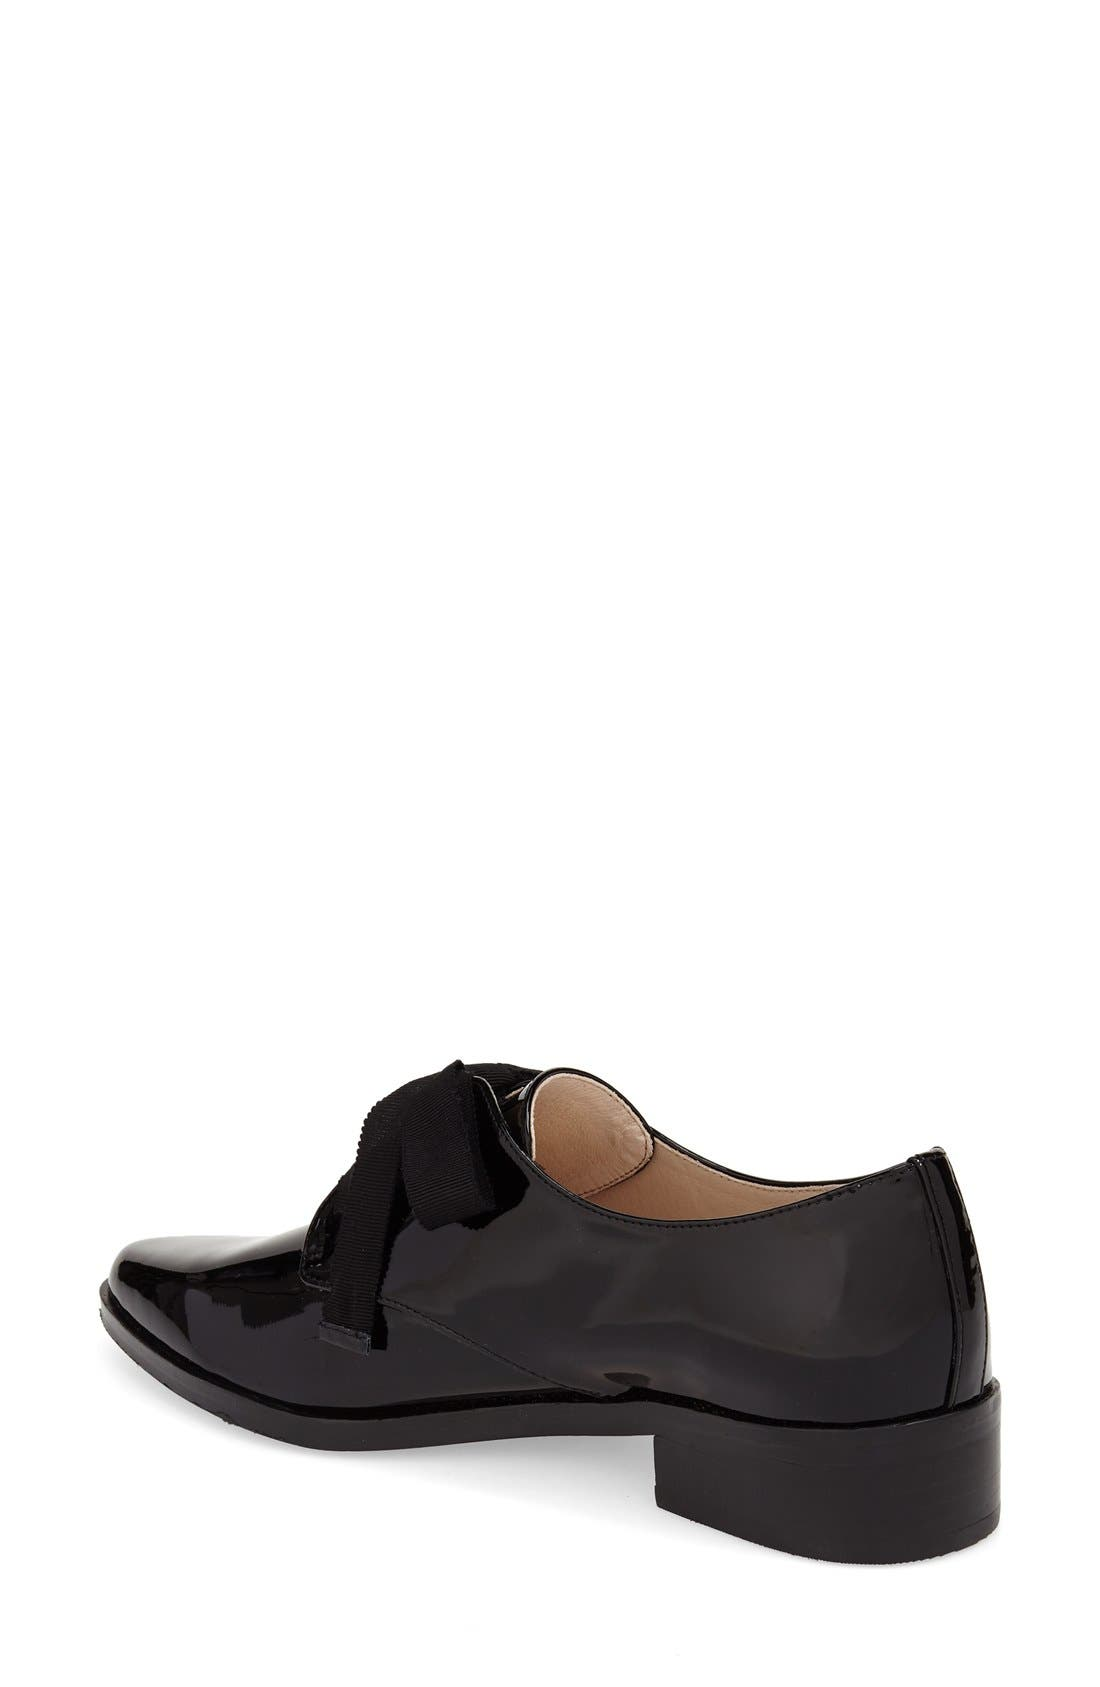 'Adwin' Almond Toe Oxford,                             Alternate thumbnail 2, color,                             Black Patent